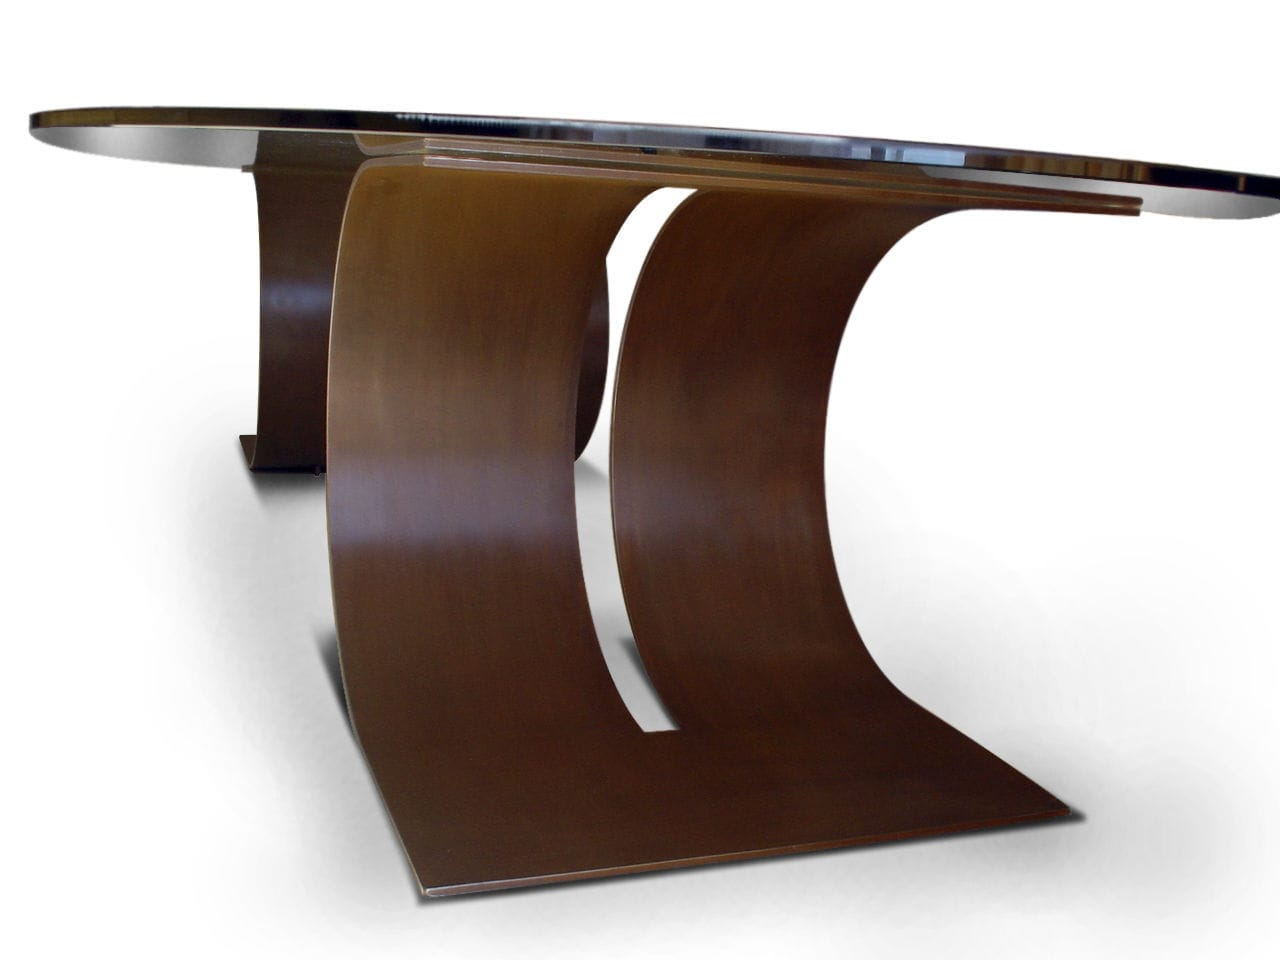 ... Contemporary Boardroom Table / Metal / Lacquered Metal / Rectangular  CARLOVI GONZALO DE SALAS ...